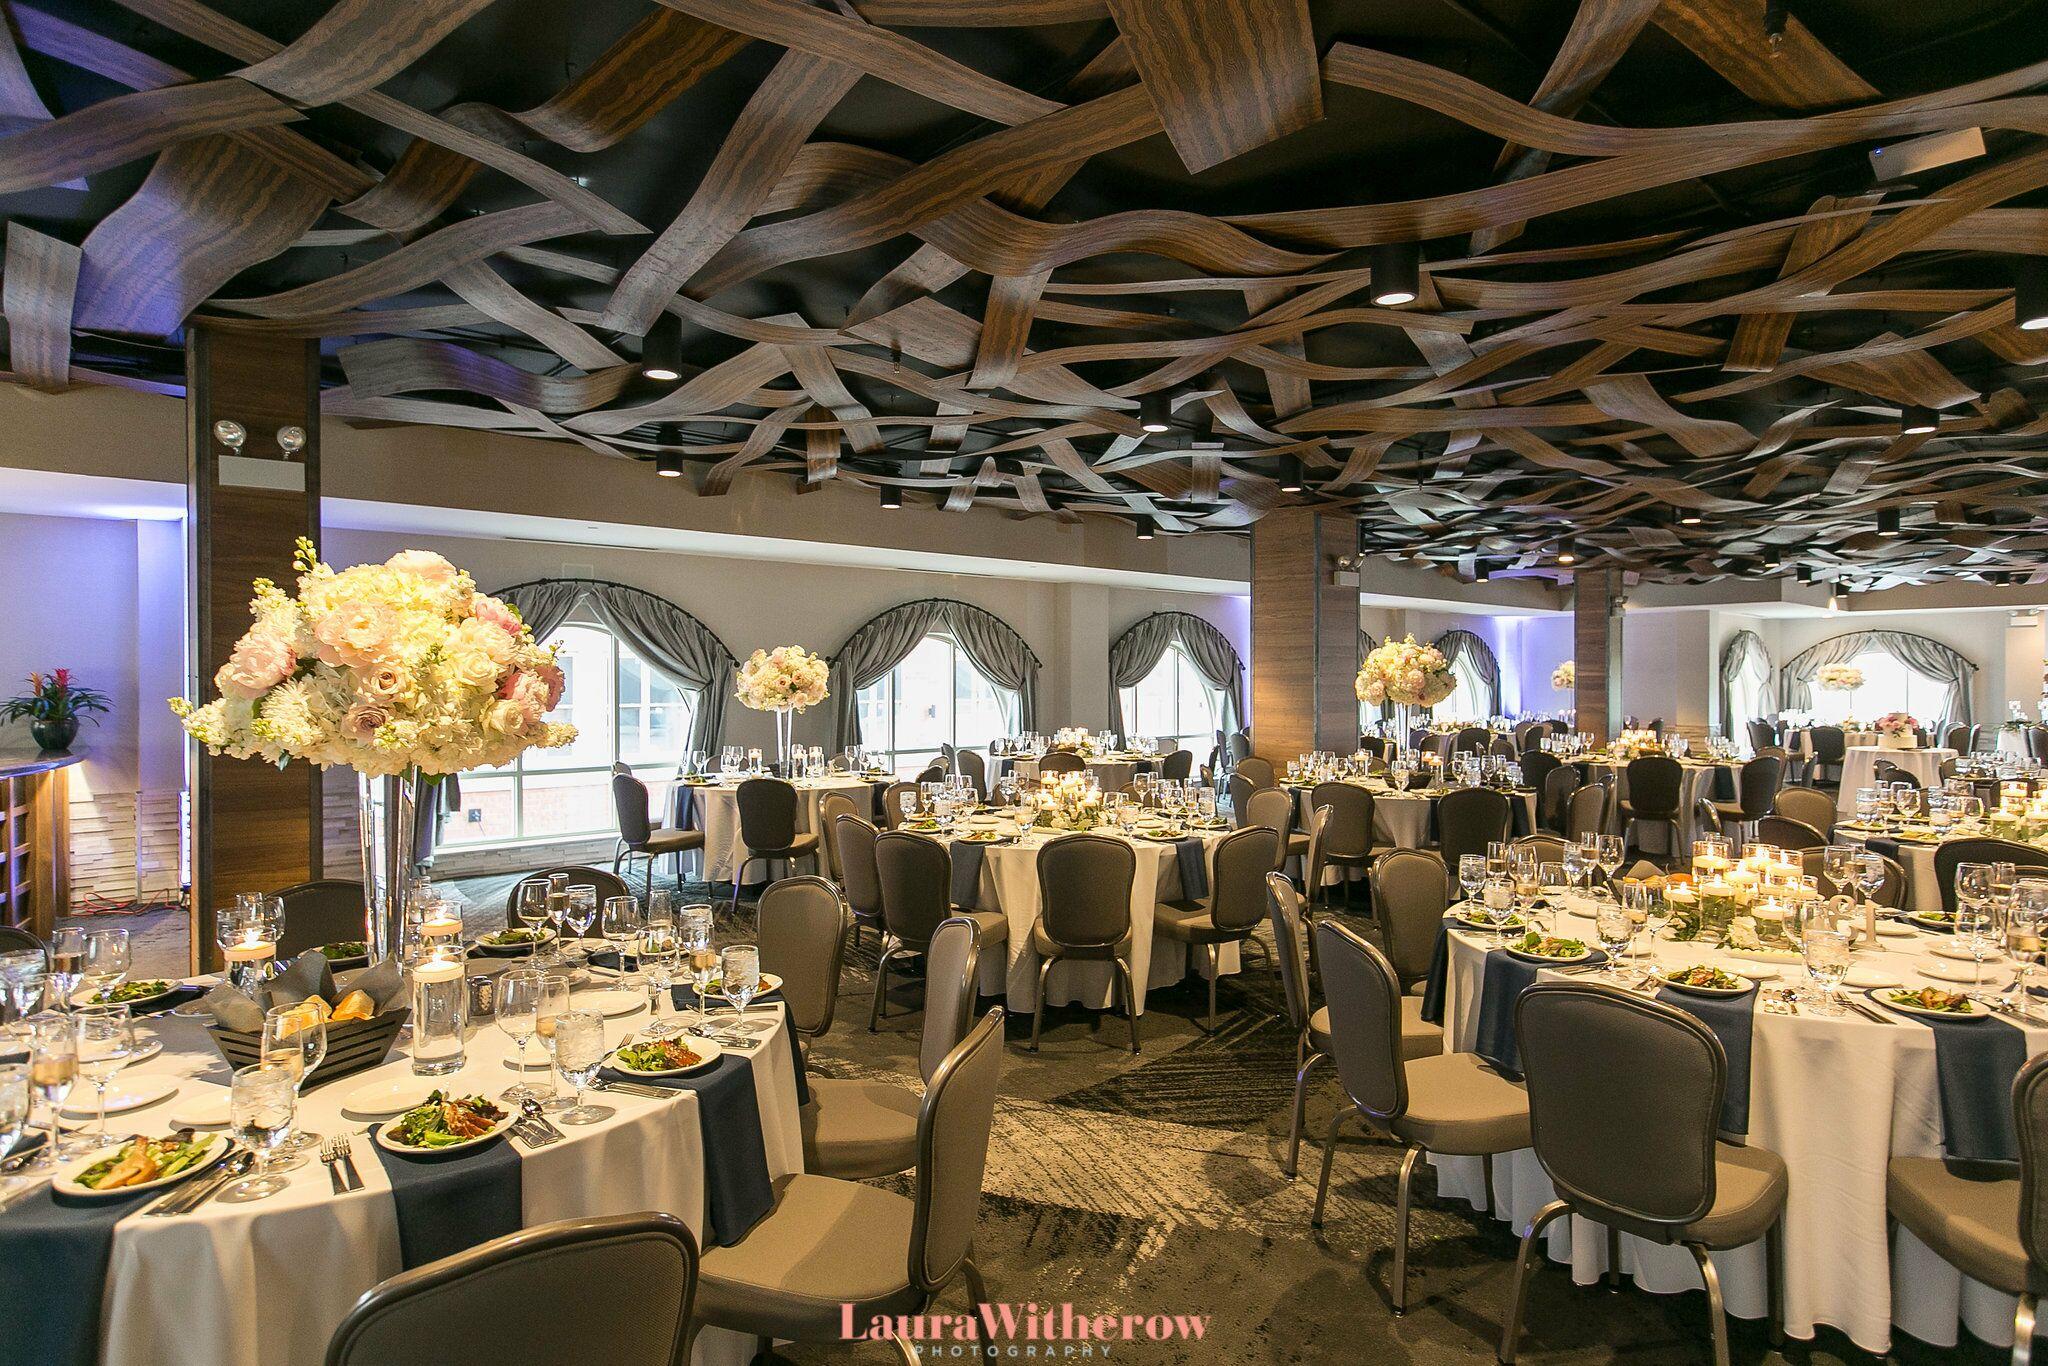 Hotel Indigo Naperville >> Elements At Water Street Hotel Indigo Reception Venues